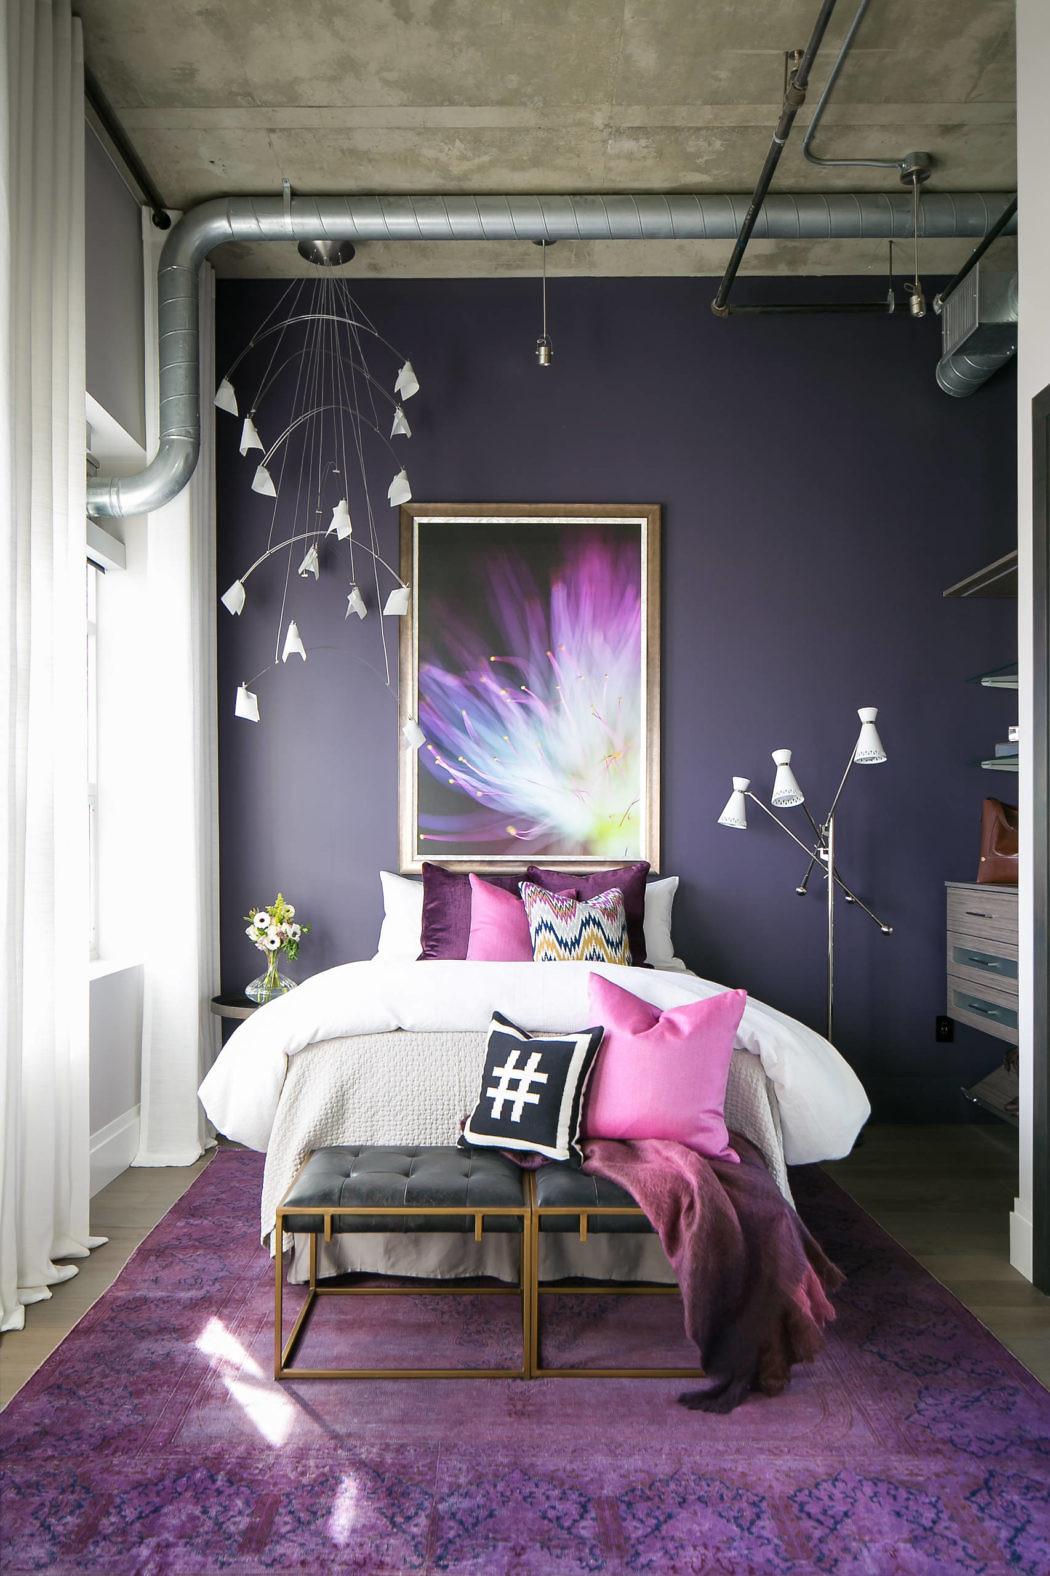 Denver loft style living by robeson design homeadore - Dormitorios matrimoniales modernos ...